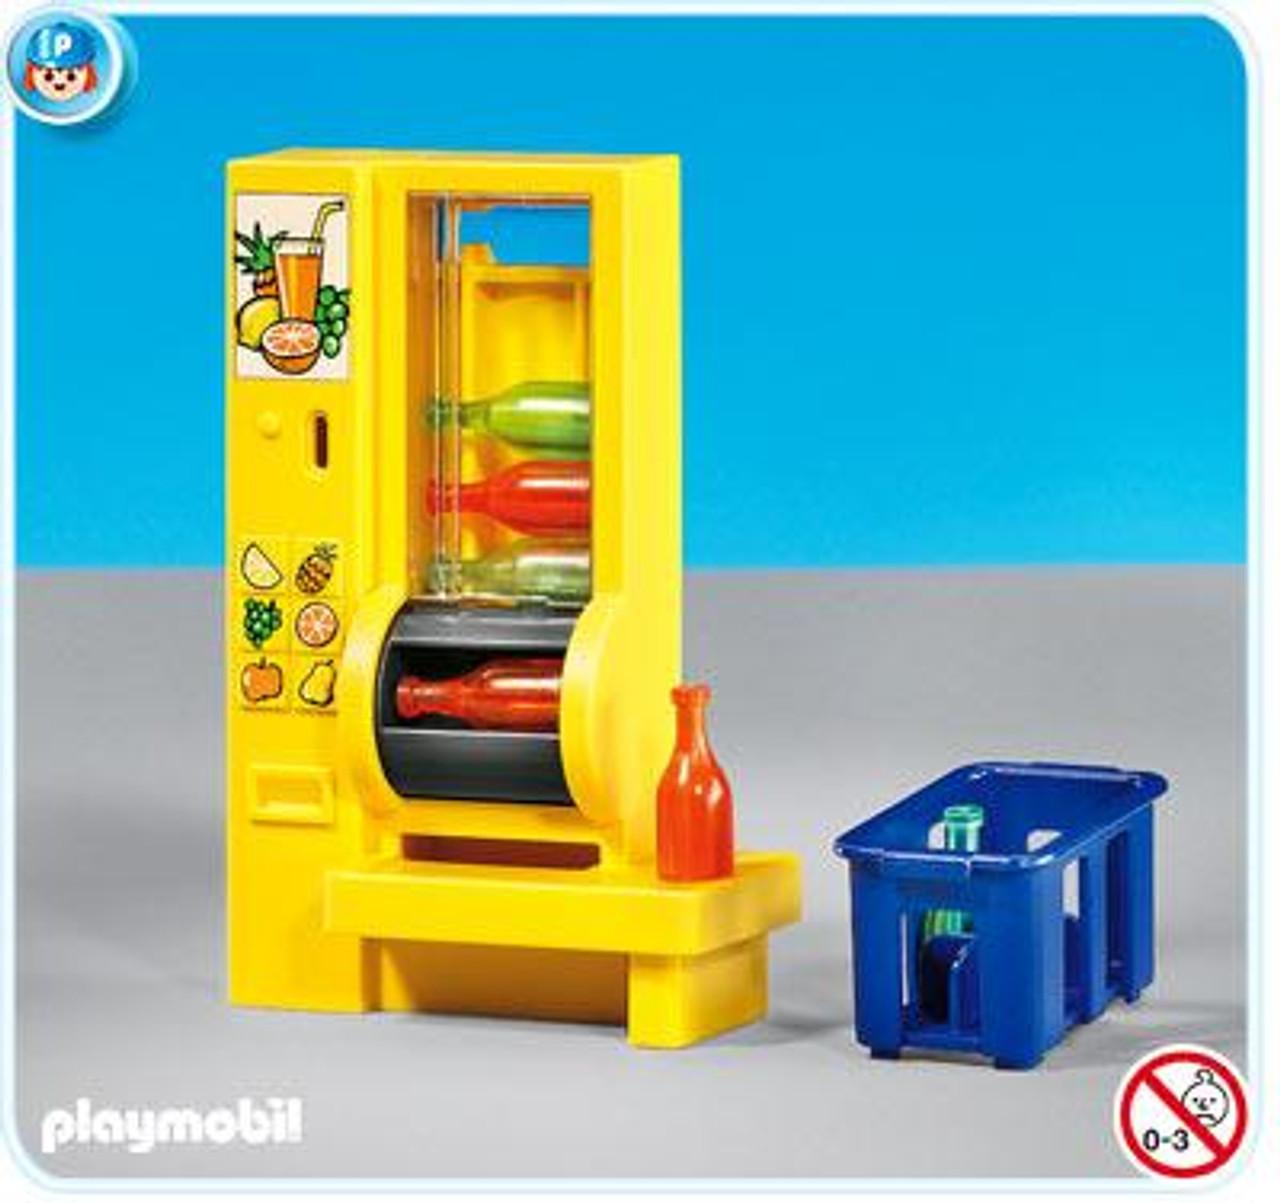 Playmobil Suburban Life Vending Machine Set #7931